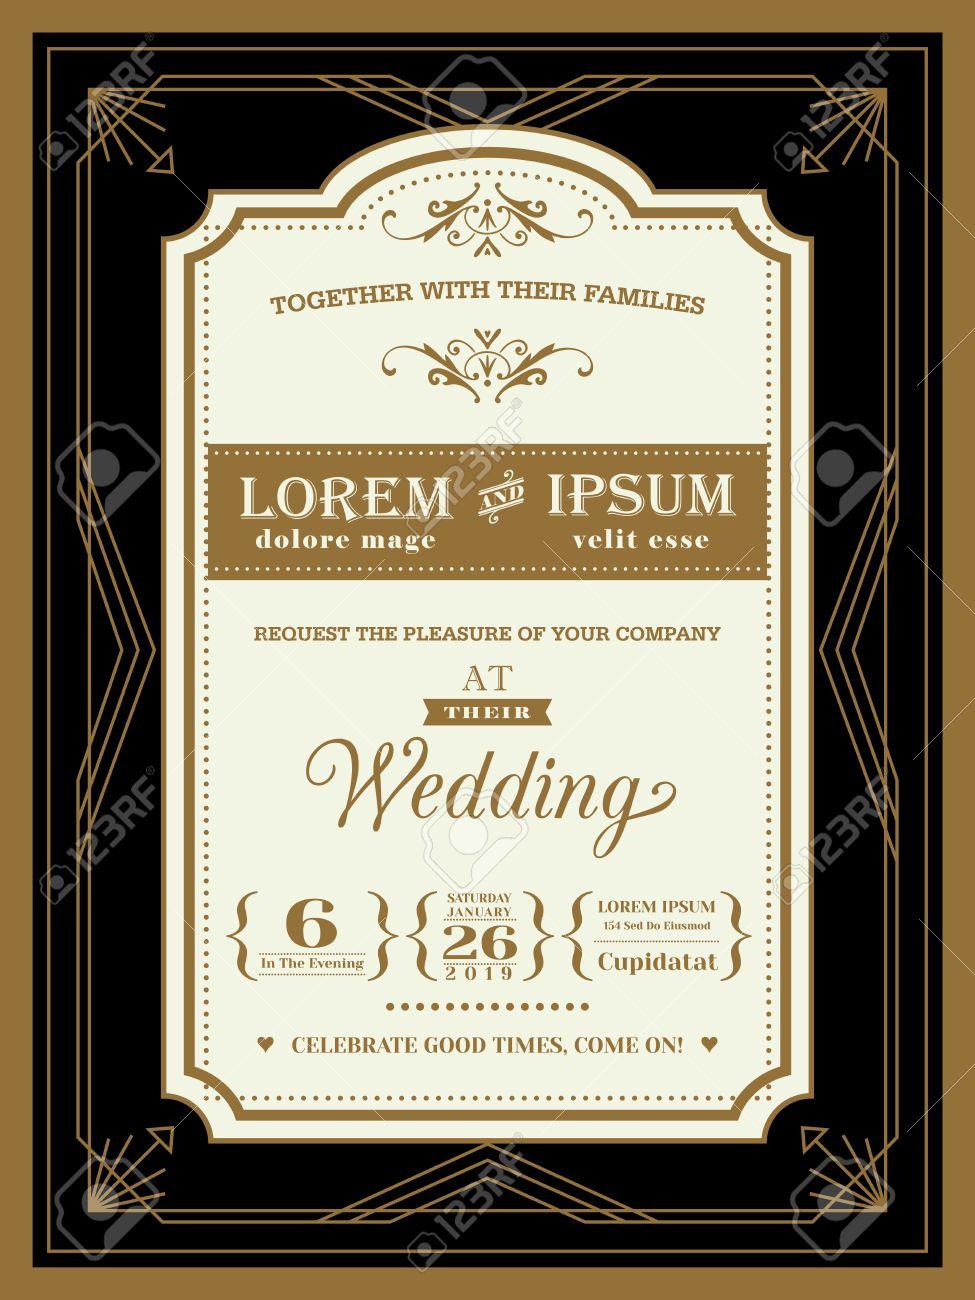 Vintage Wedding invitation border and frame template - 52125844